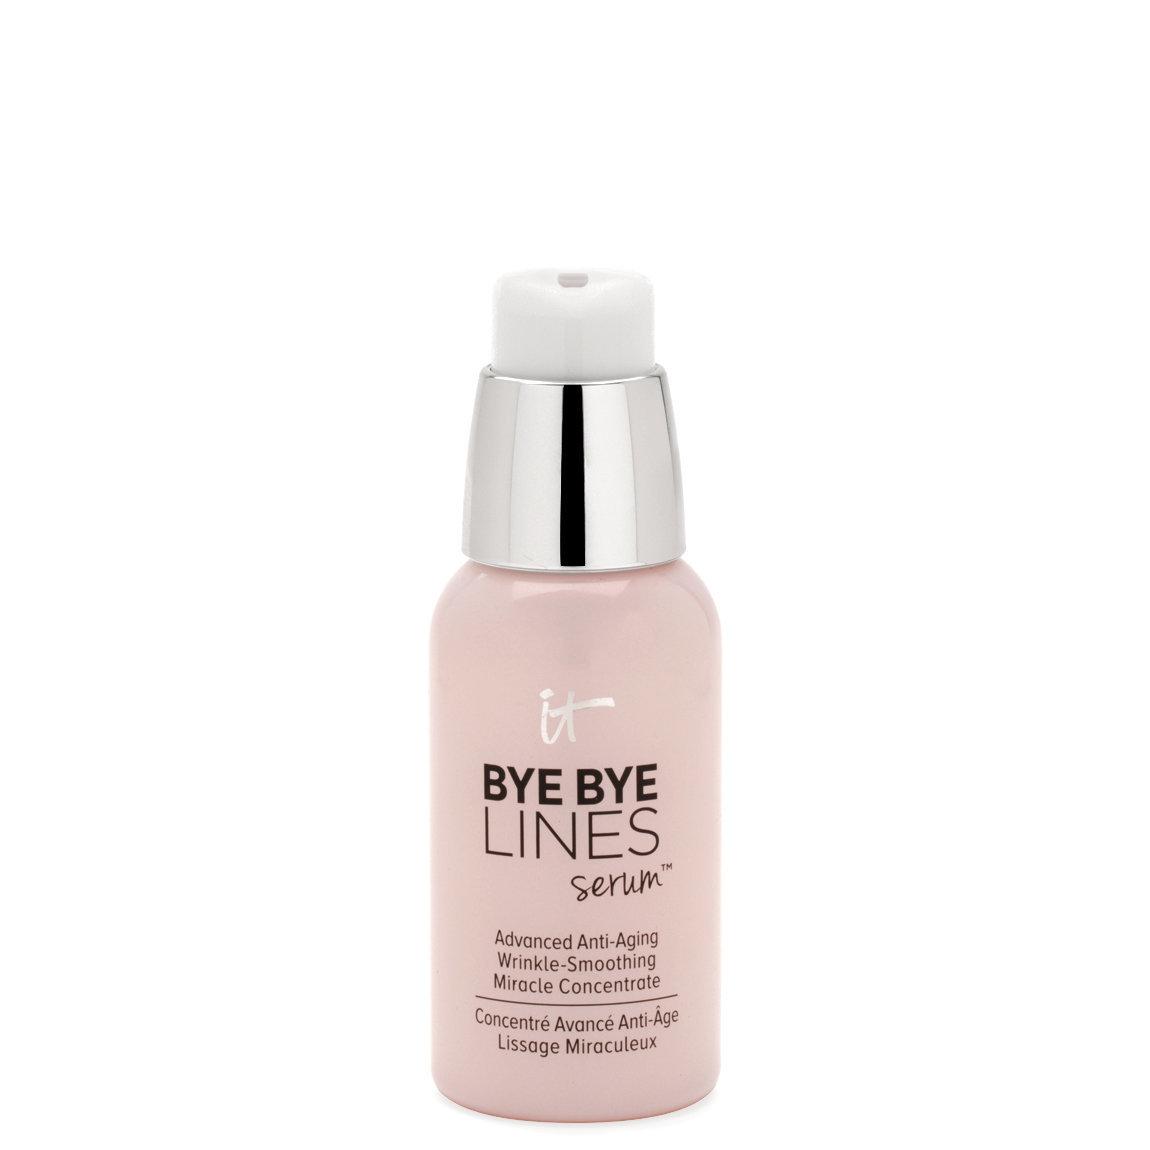 IT Cosmetics  Bye Bye Lines Serum product swatch.